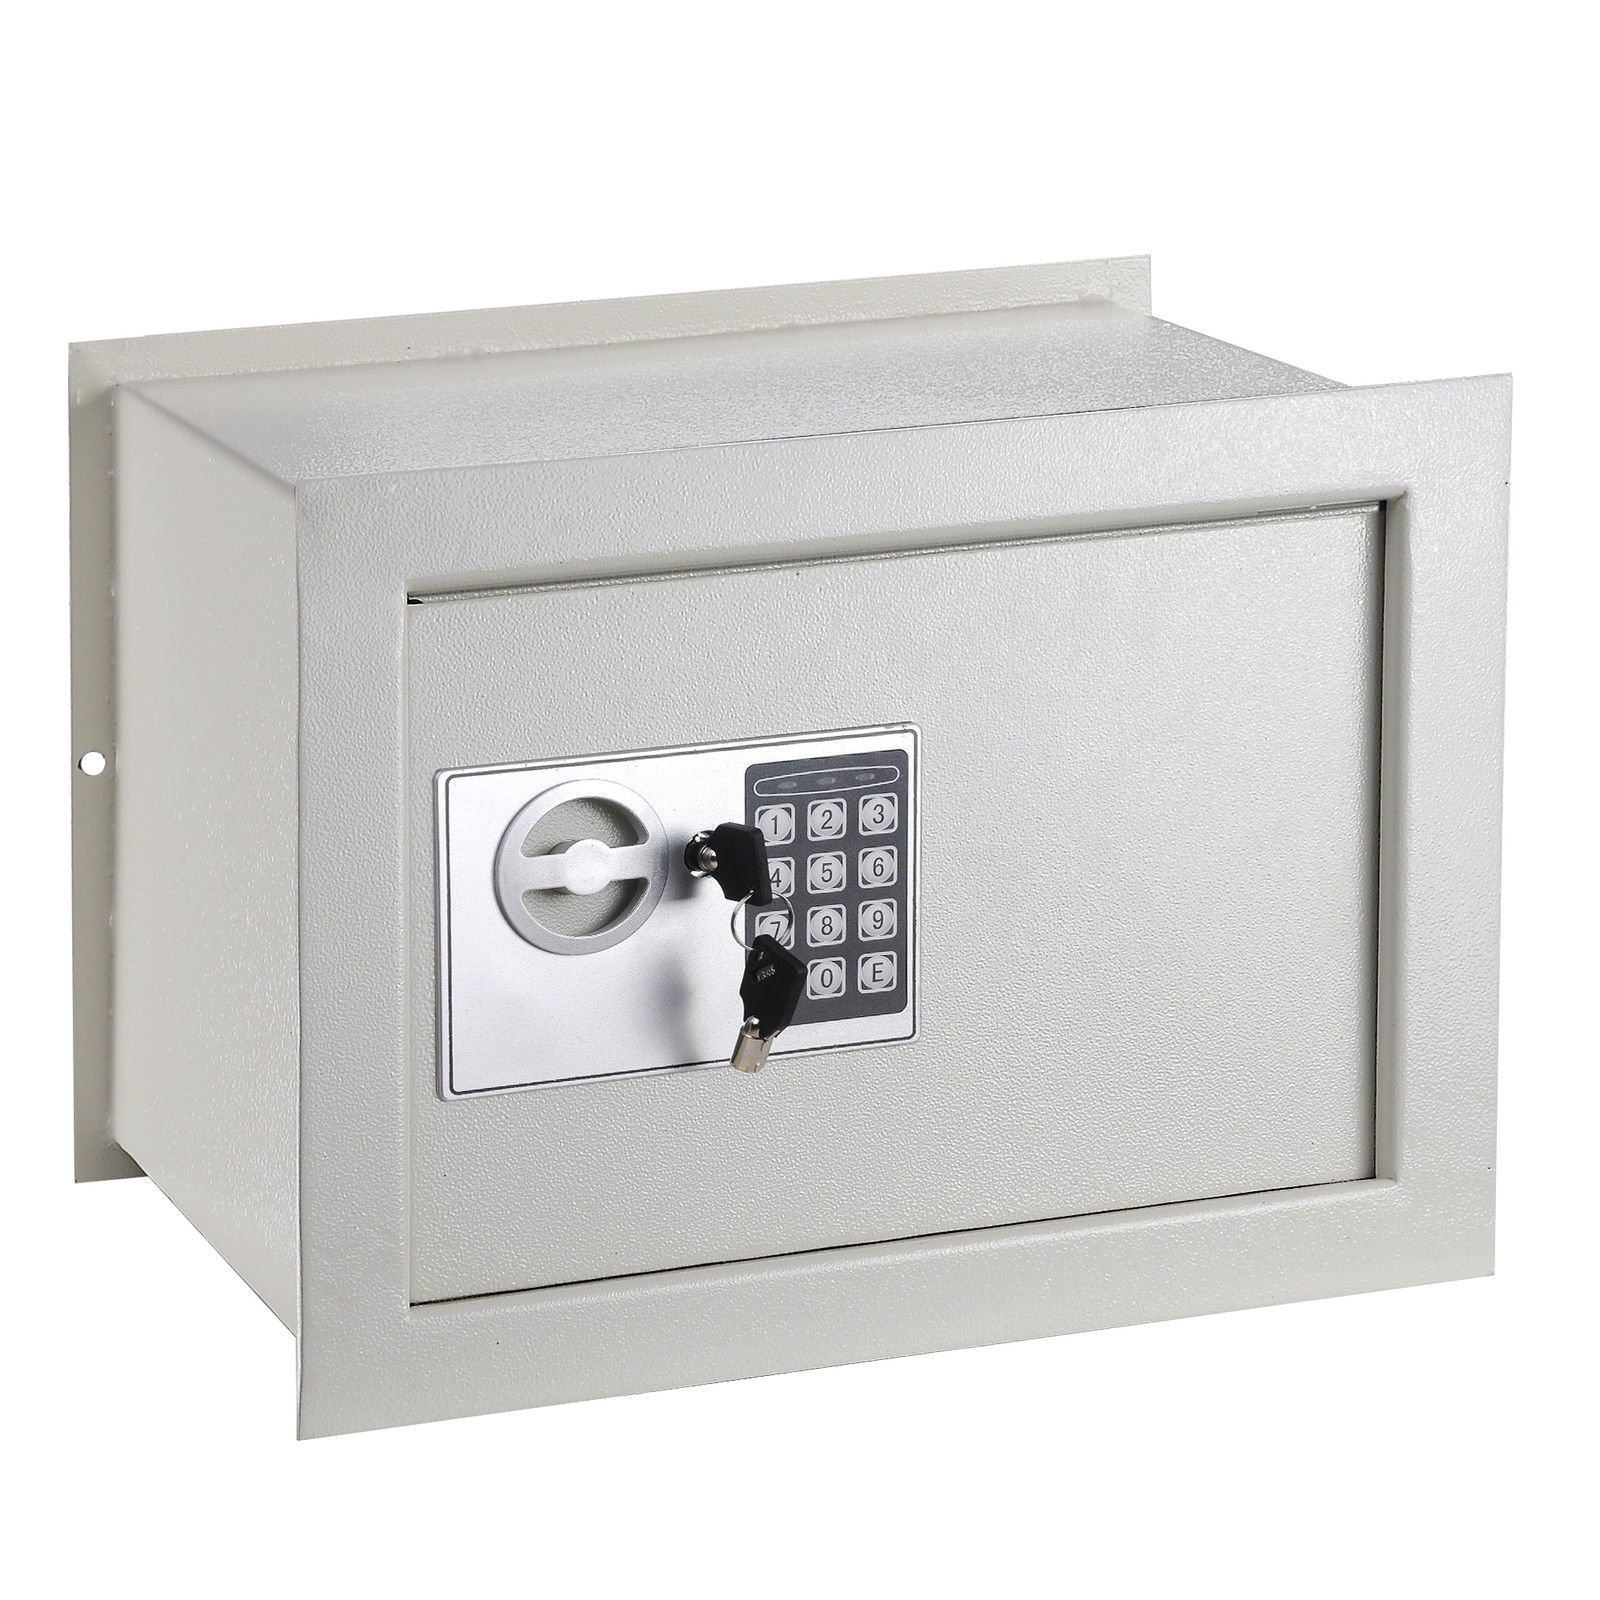 Electronic Safe Box Wall Inground 1.0 CF Digital Keypad Hotel Home Office Security Lock